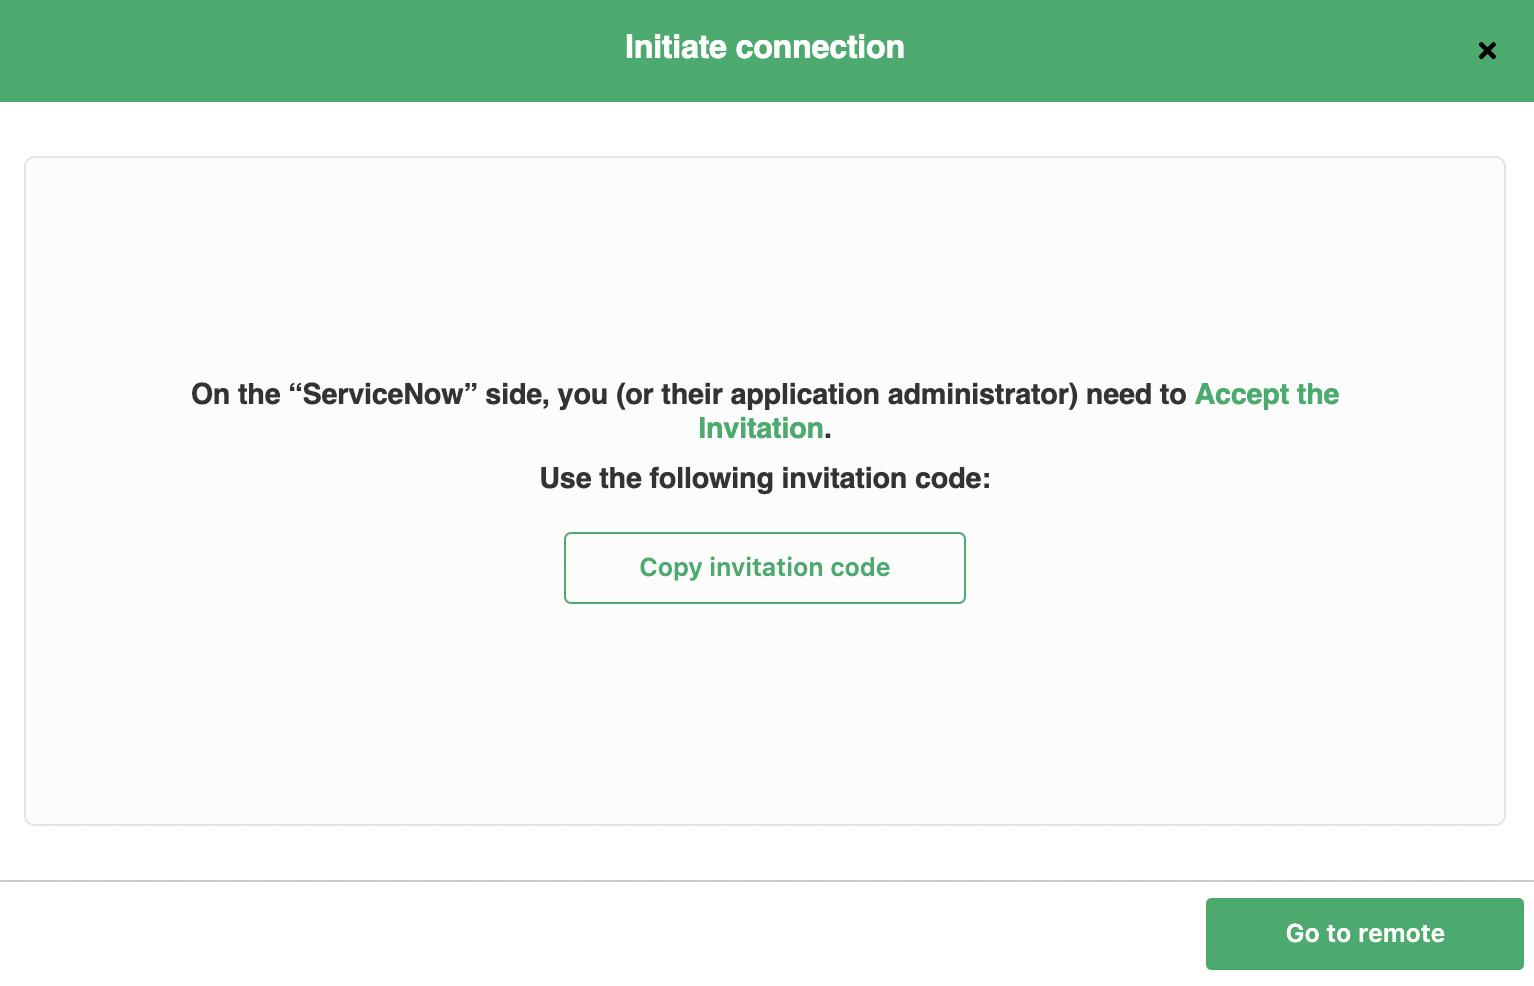 Invitation code for Zendesk ServiceNow integration